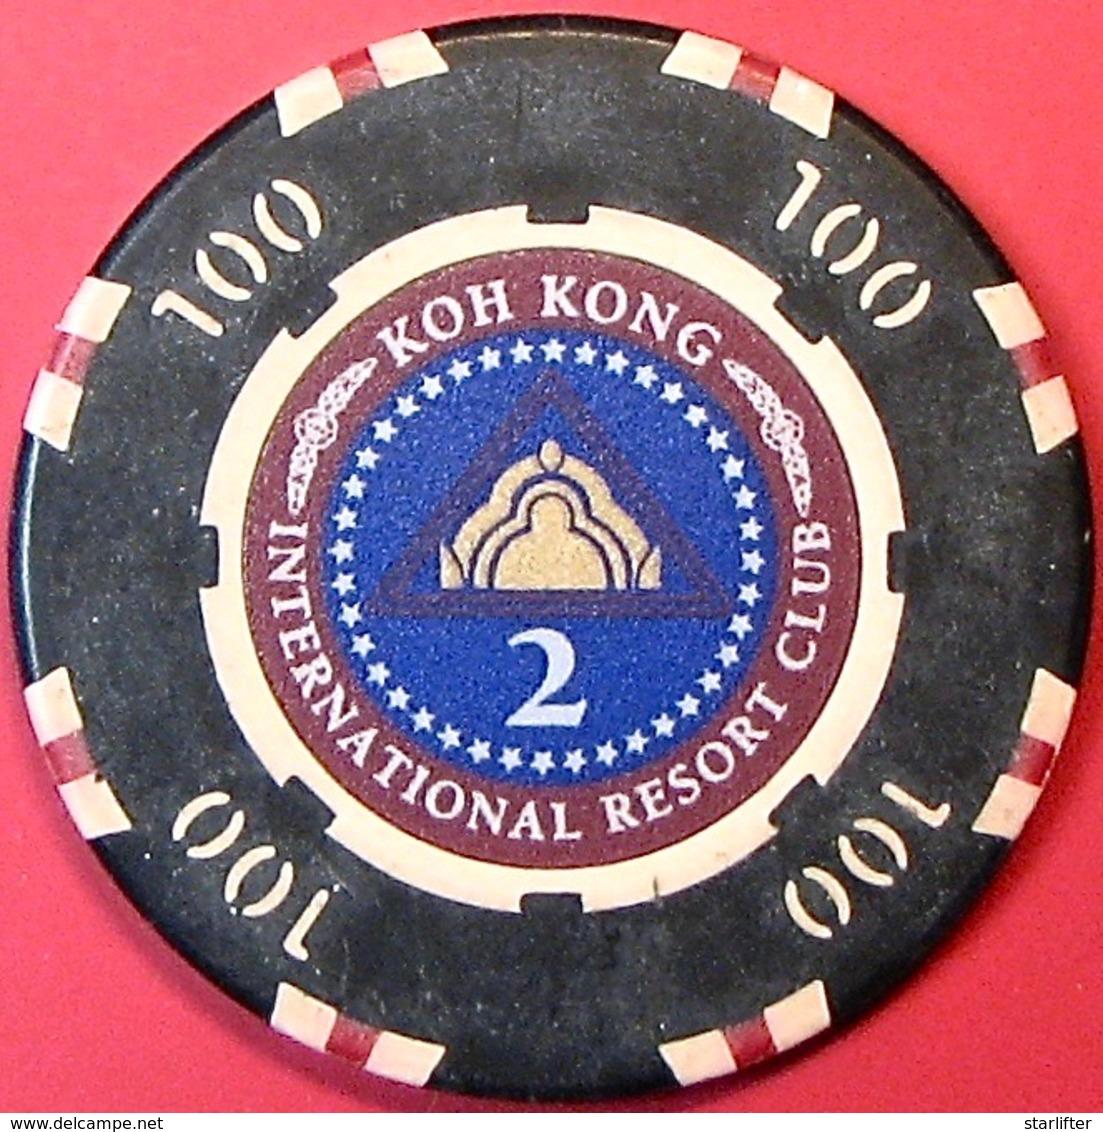 $100 Casino Chip. Koh Kong Casino, Koh Kong, Cambodia. Q06. - Casino